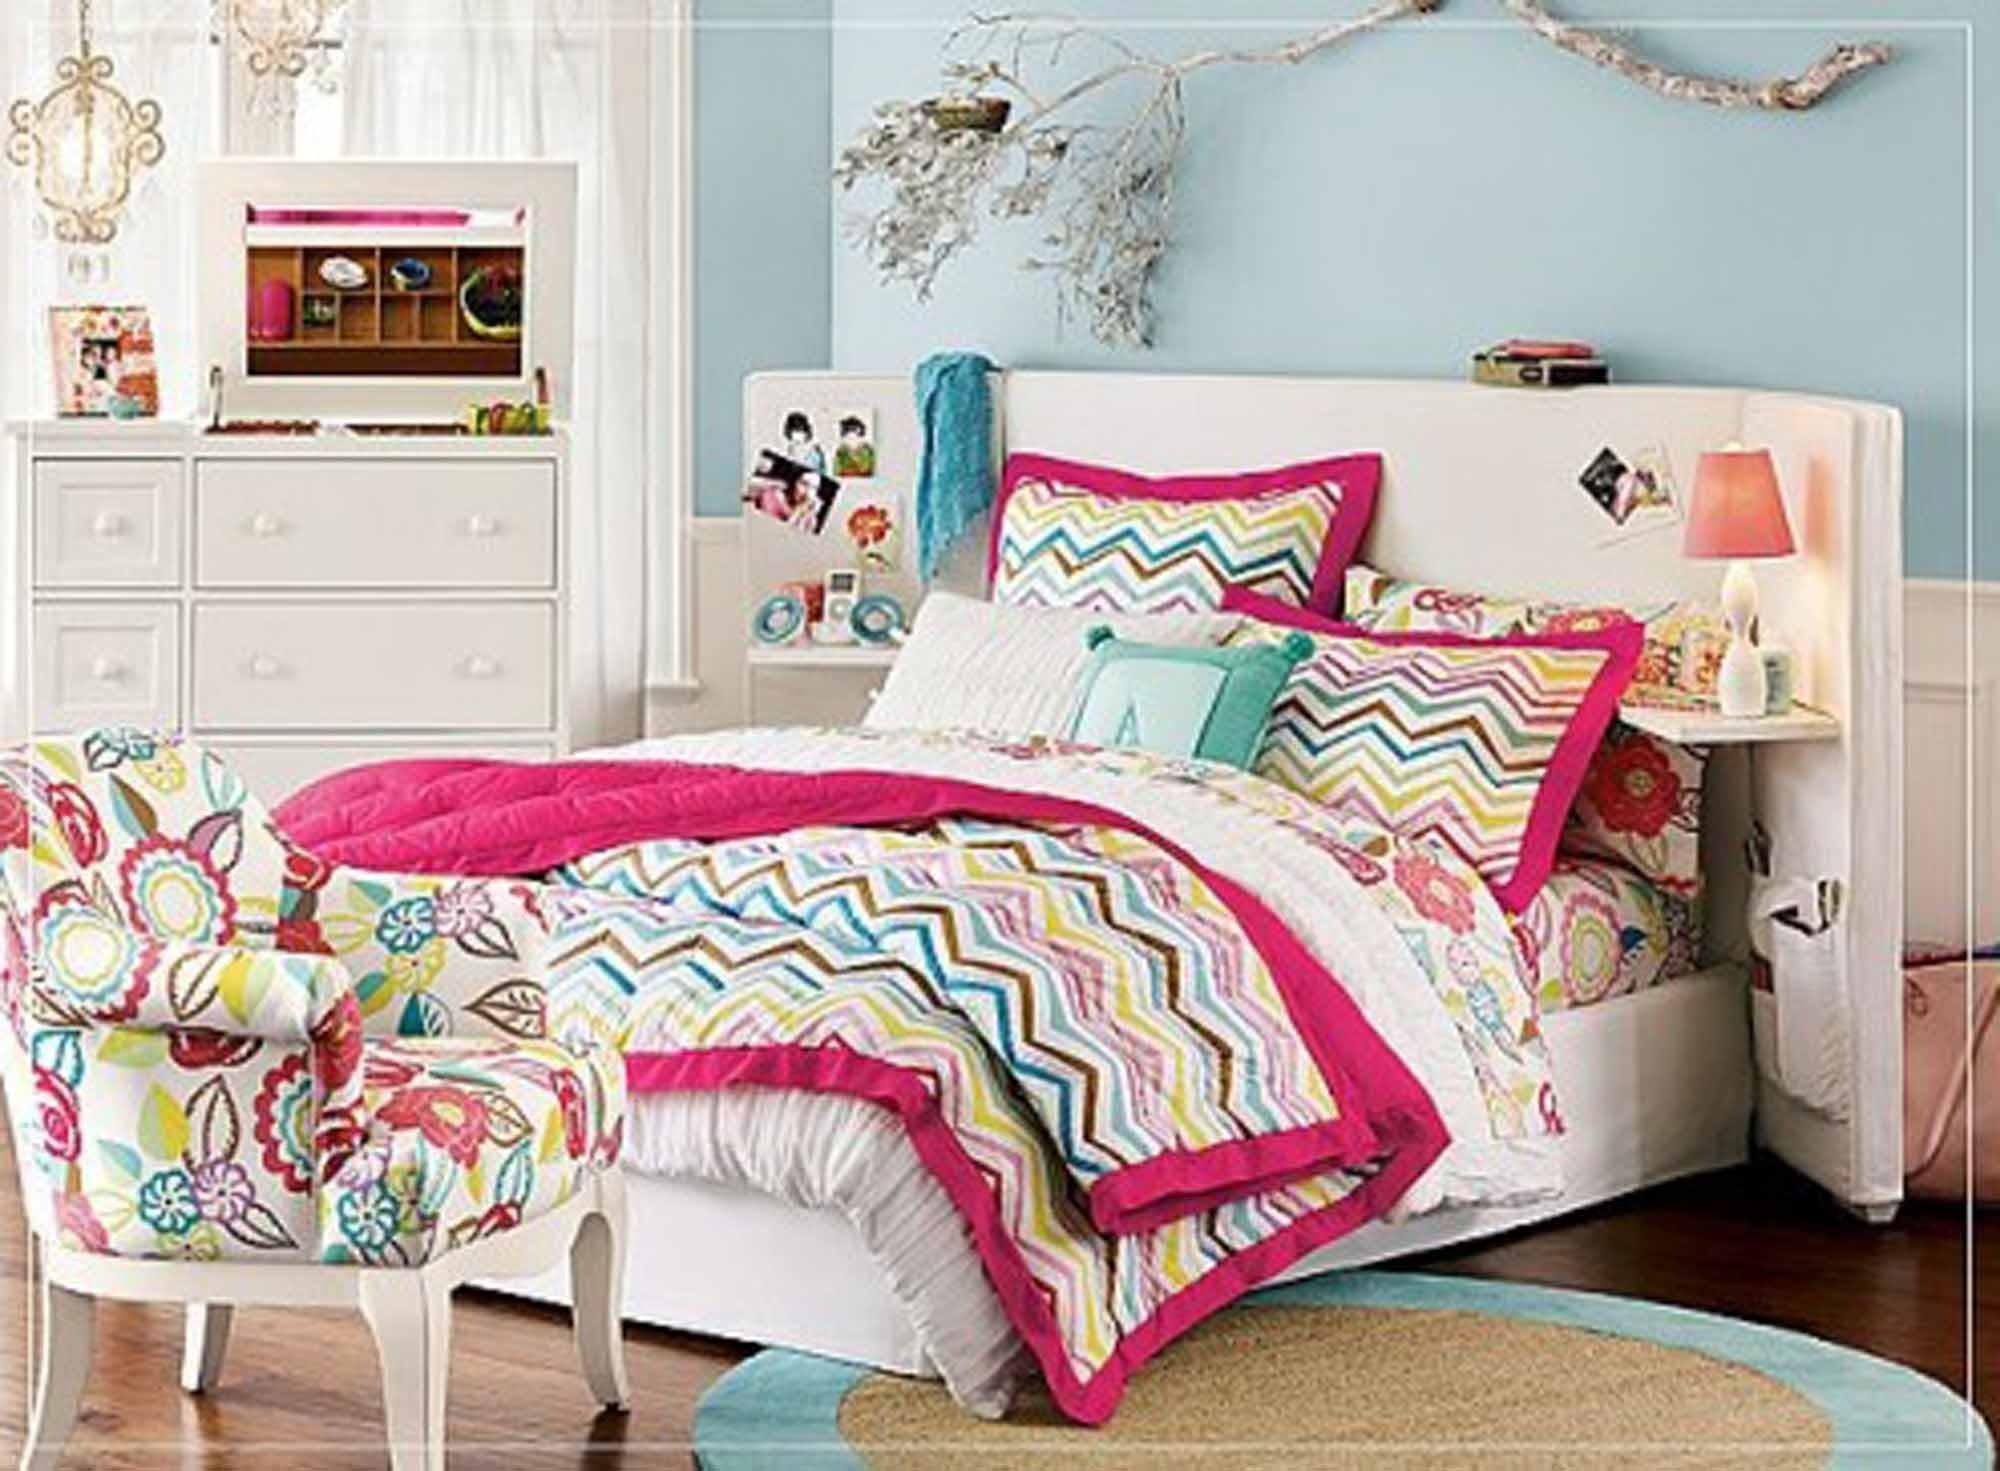 outstanding teen girl bedroom ideas | Cute Wallpapers for Teenage Girls (29+ images)